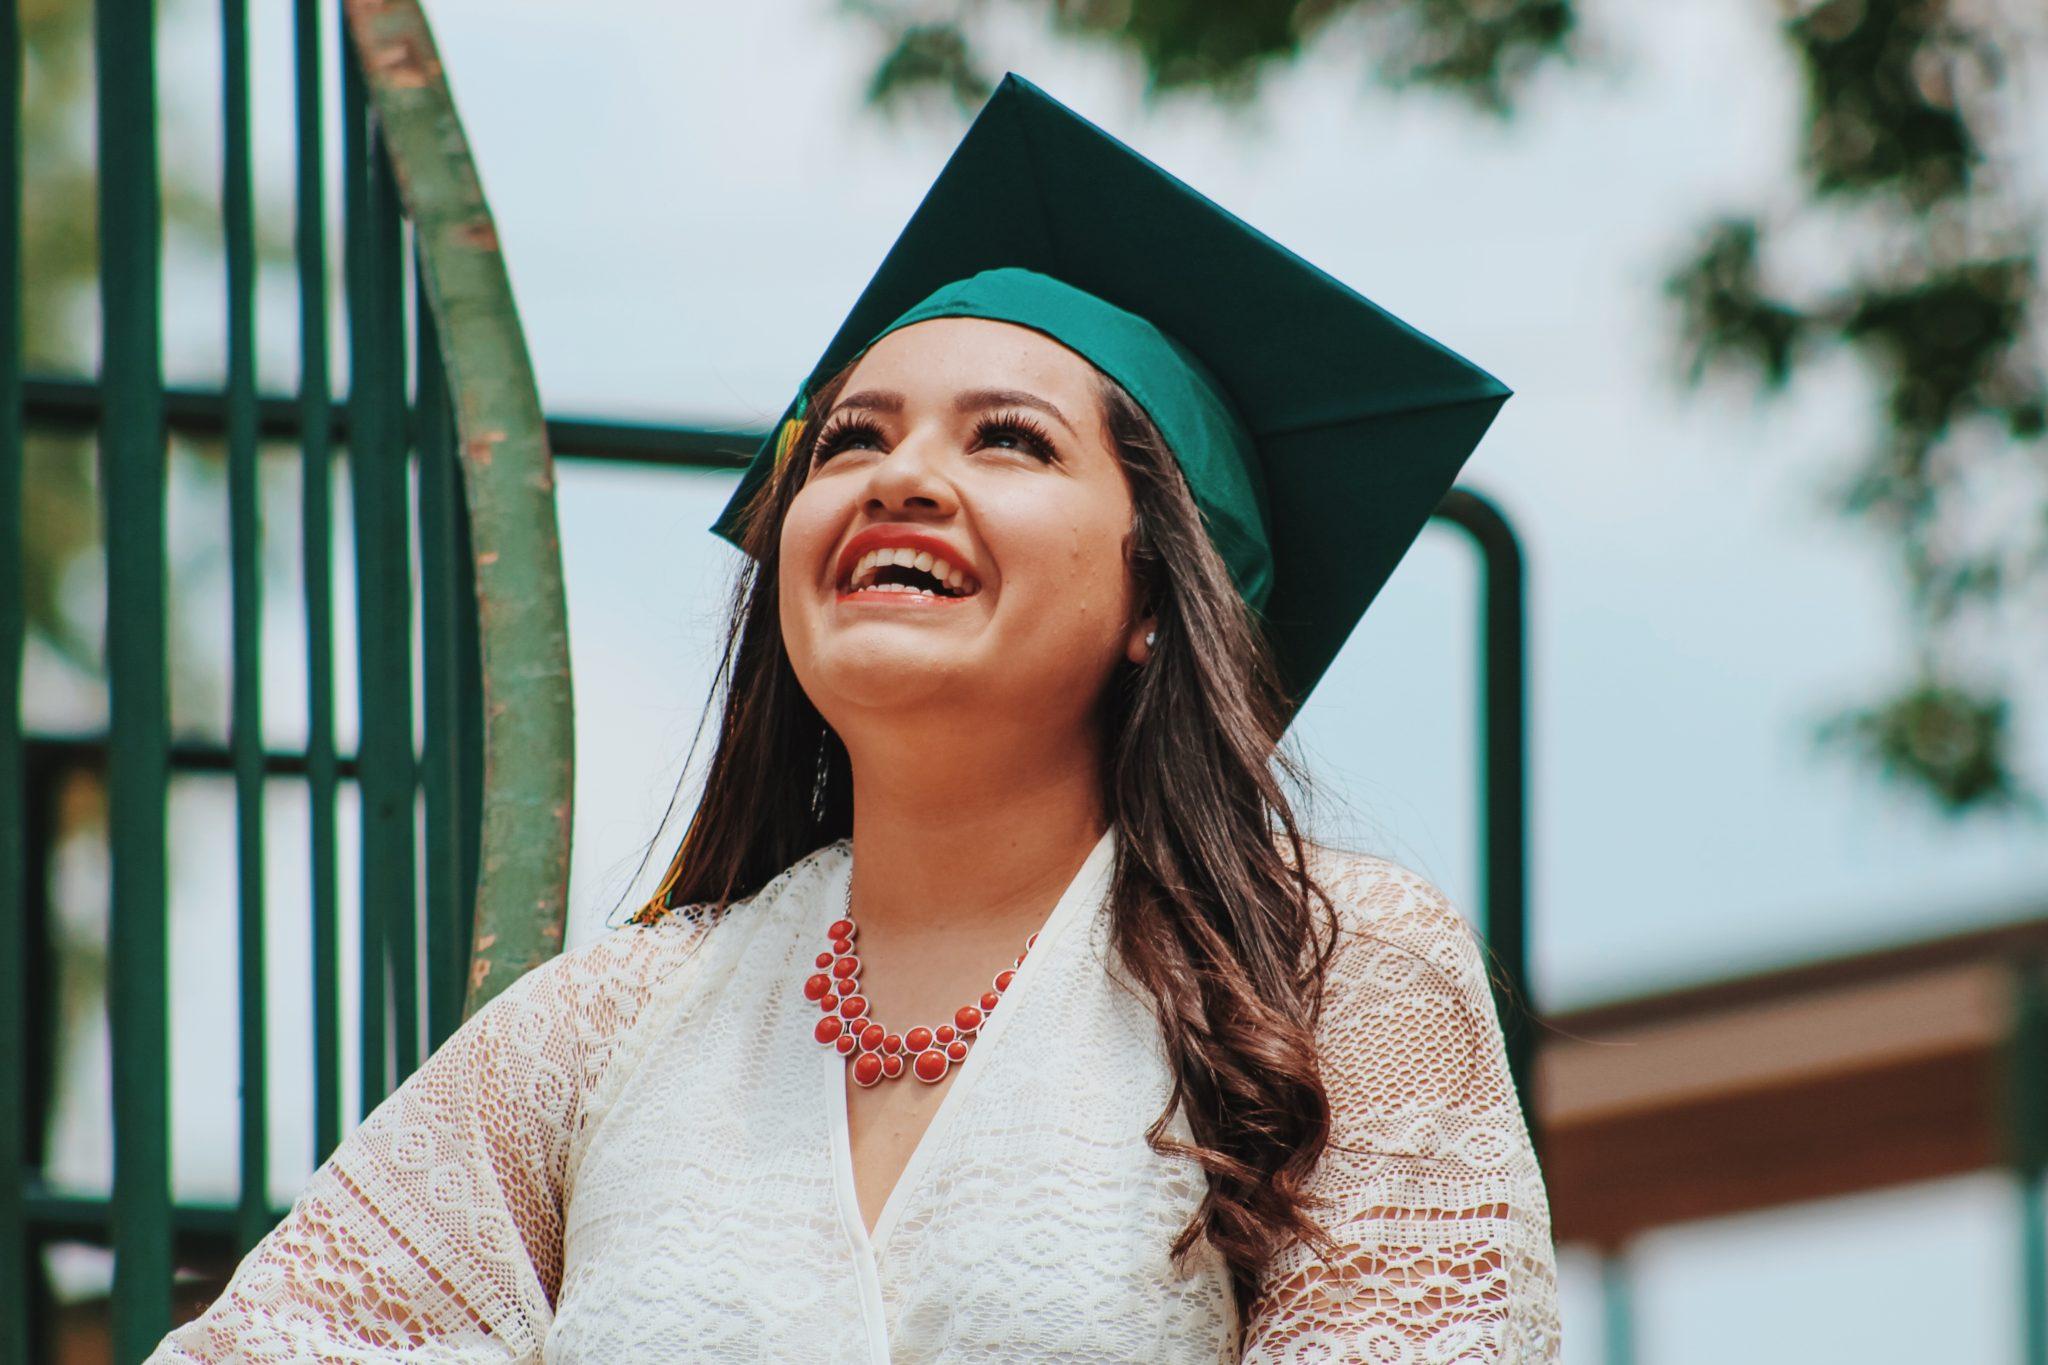 What I wish I knew when I graduated high school